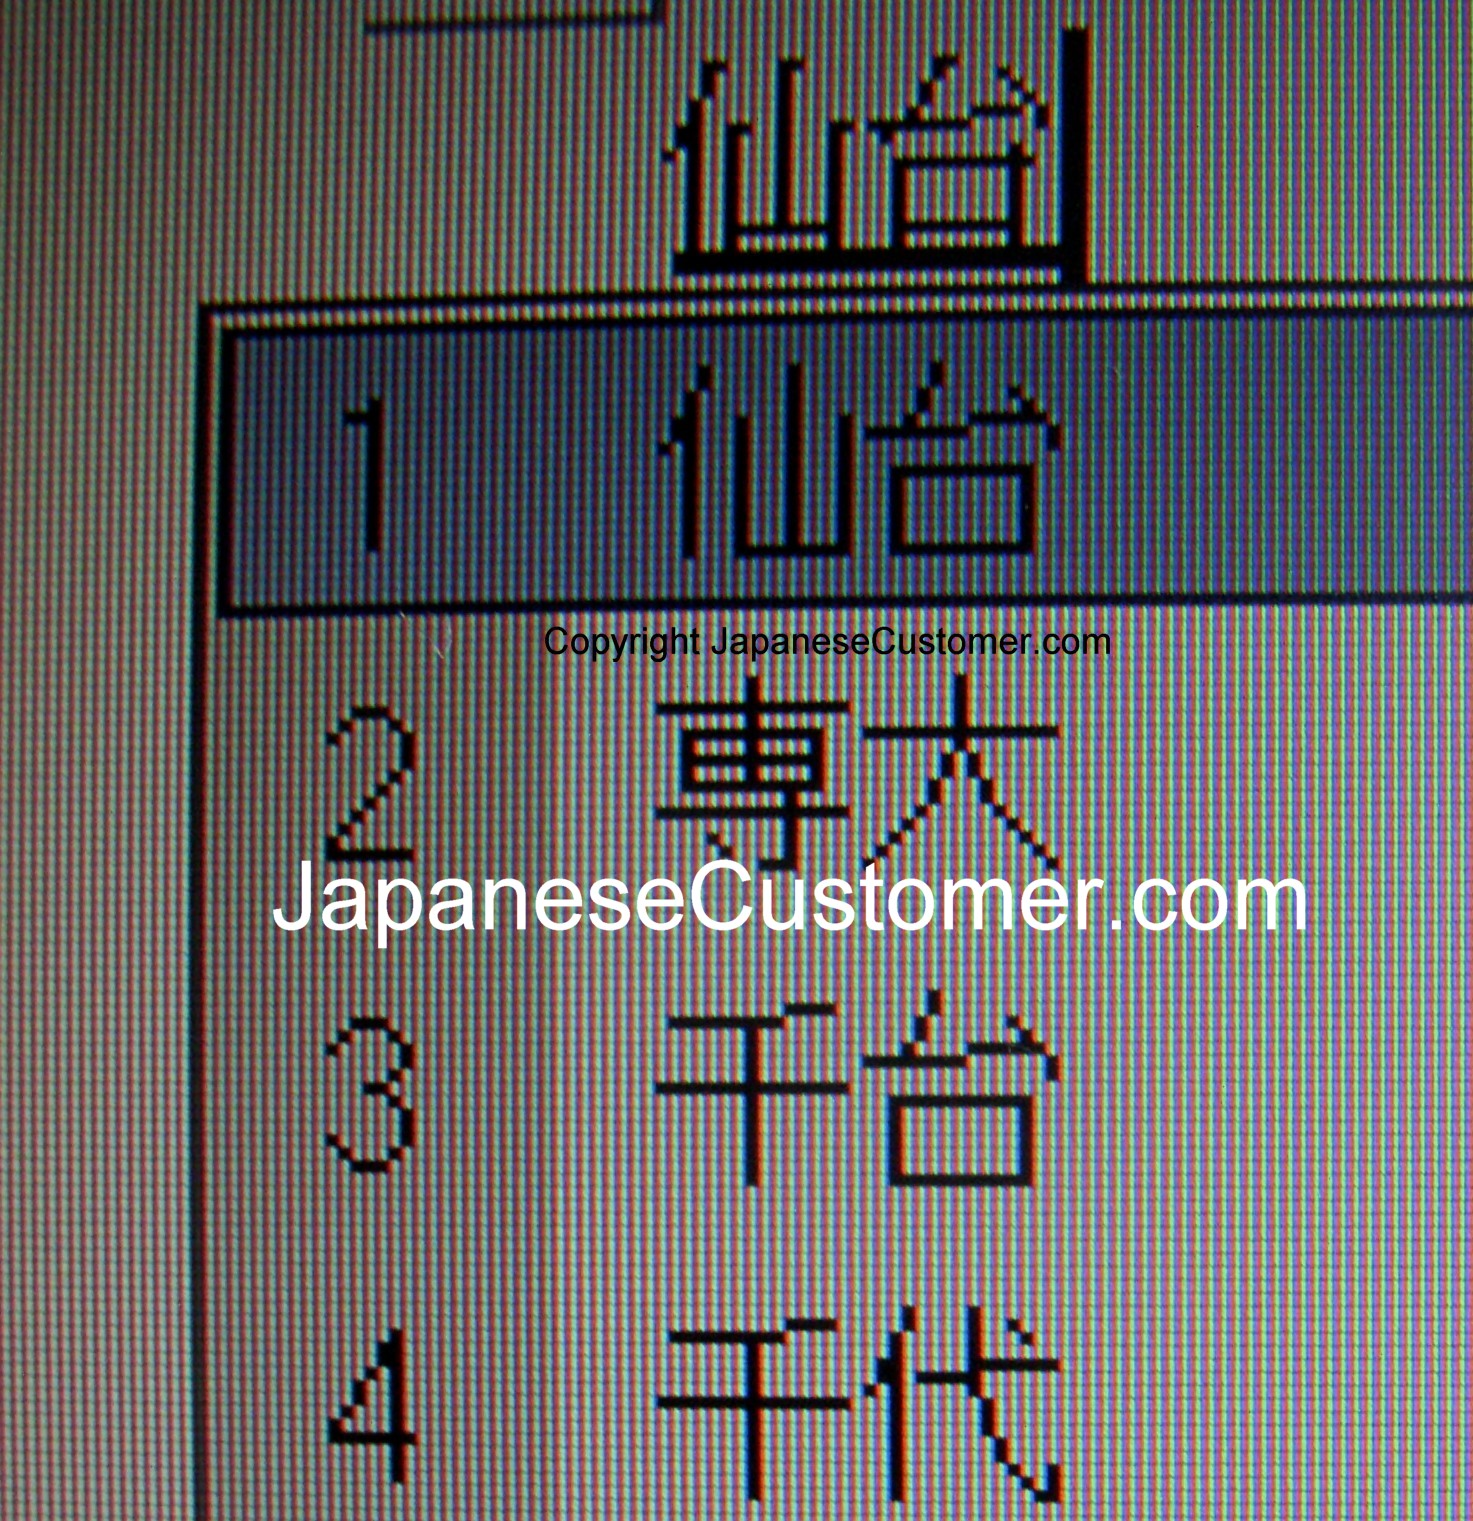 Looking up Japanese characters Copyright Peter Hanami 2014